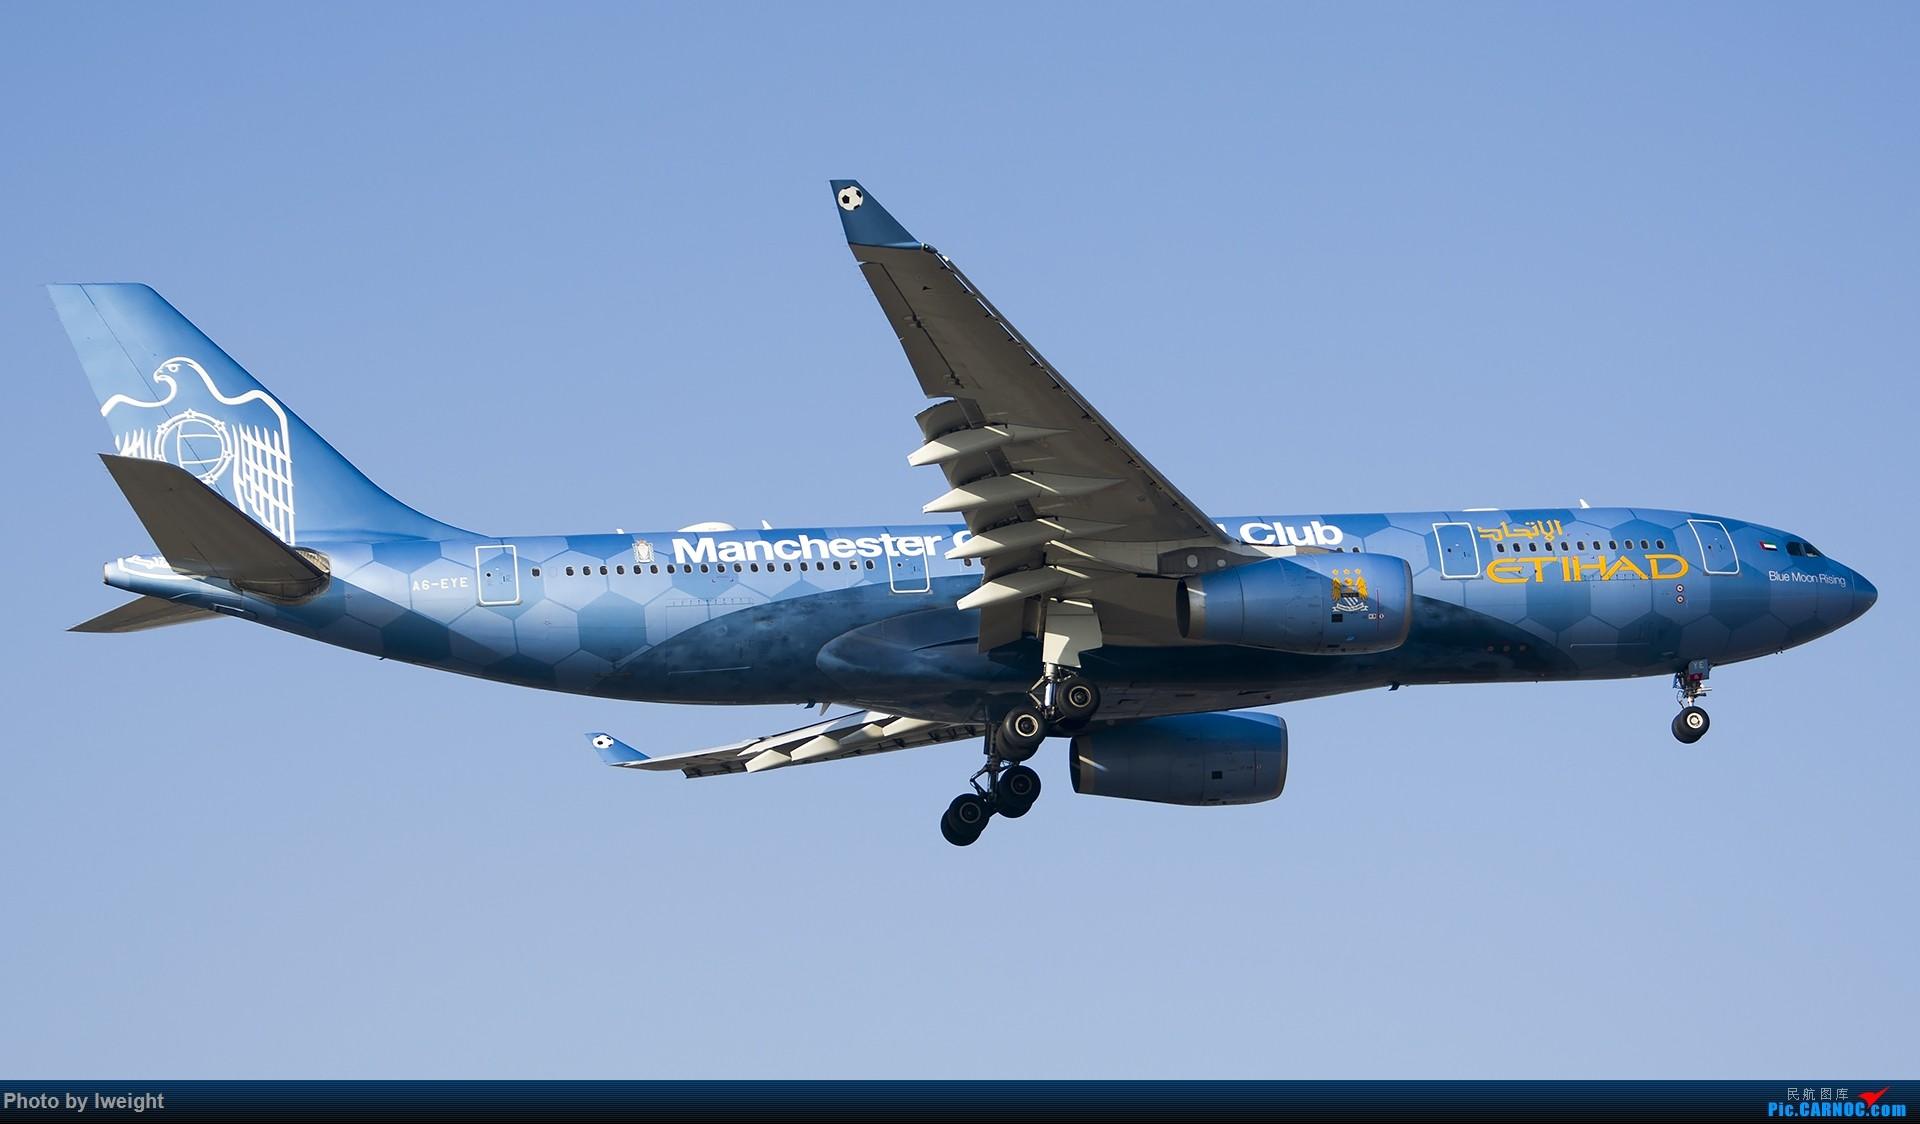 Re:[原创]庆祝升级777,发上今天在首都机场拍的所有飞机【2014-12-14】 AIRBUS A330-200 A6-EYE 中国北京首都国际机场